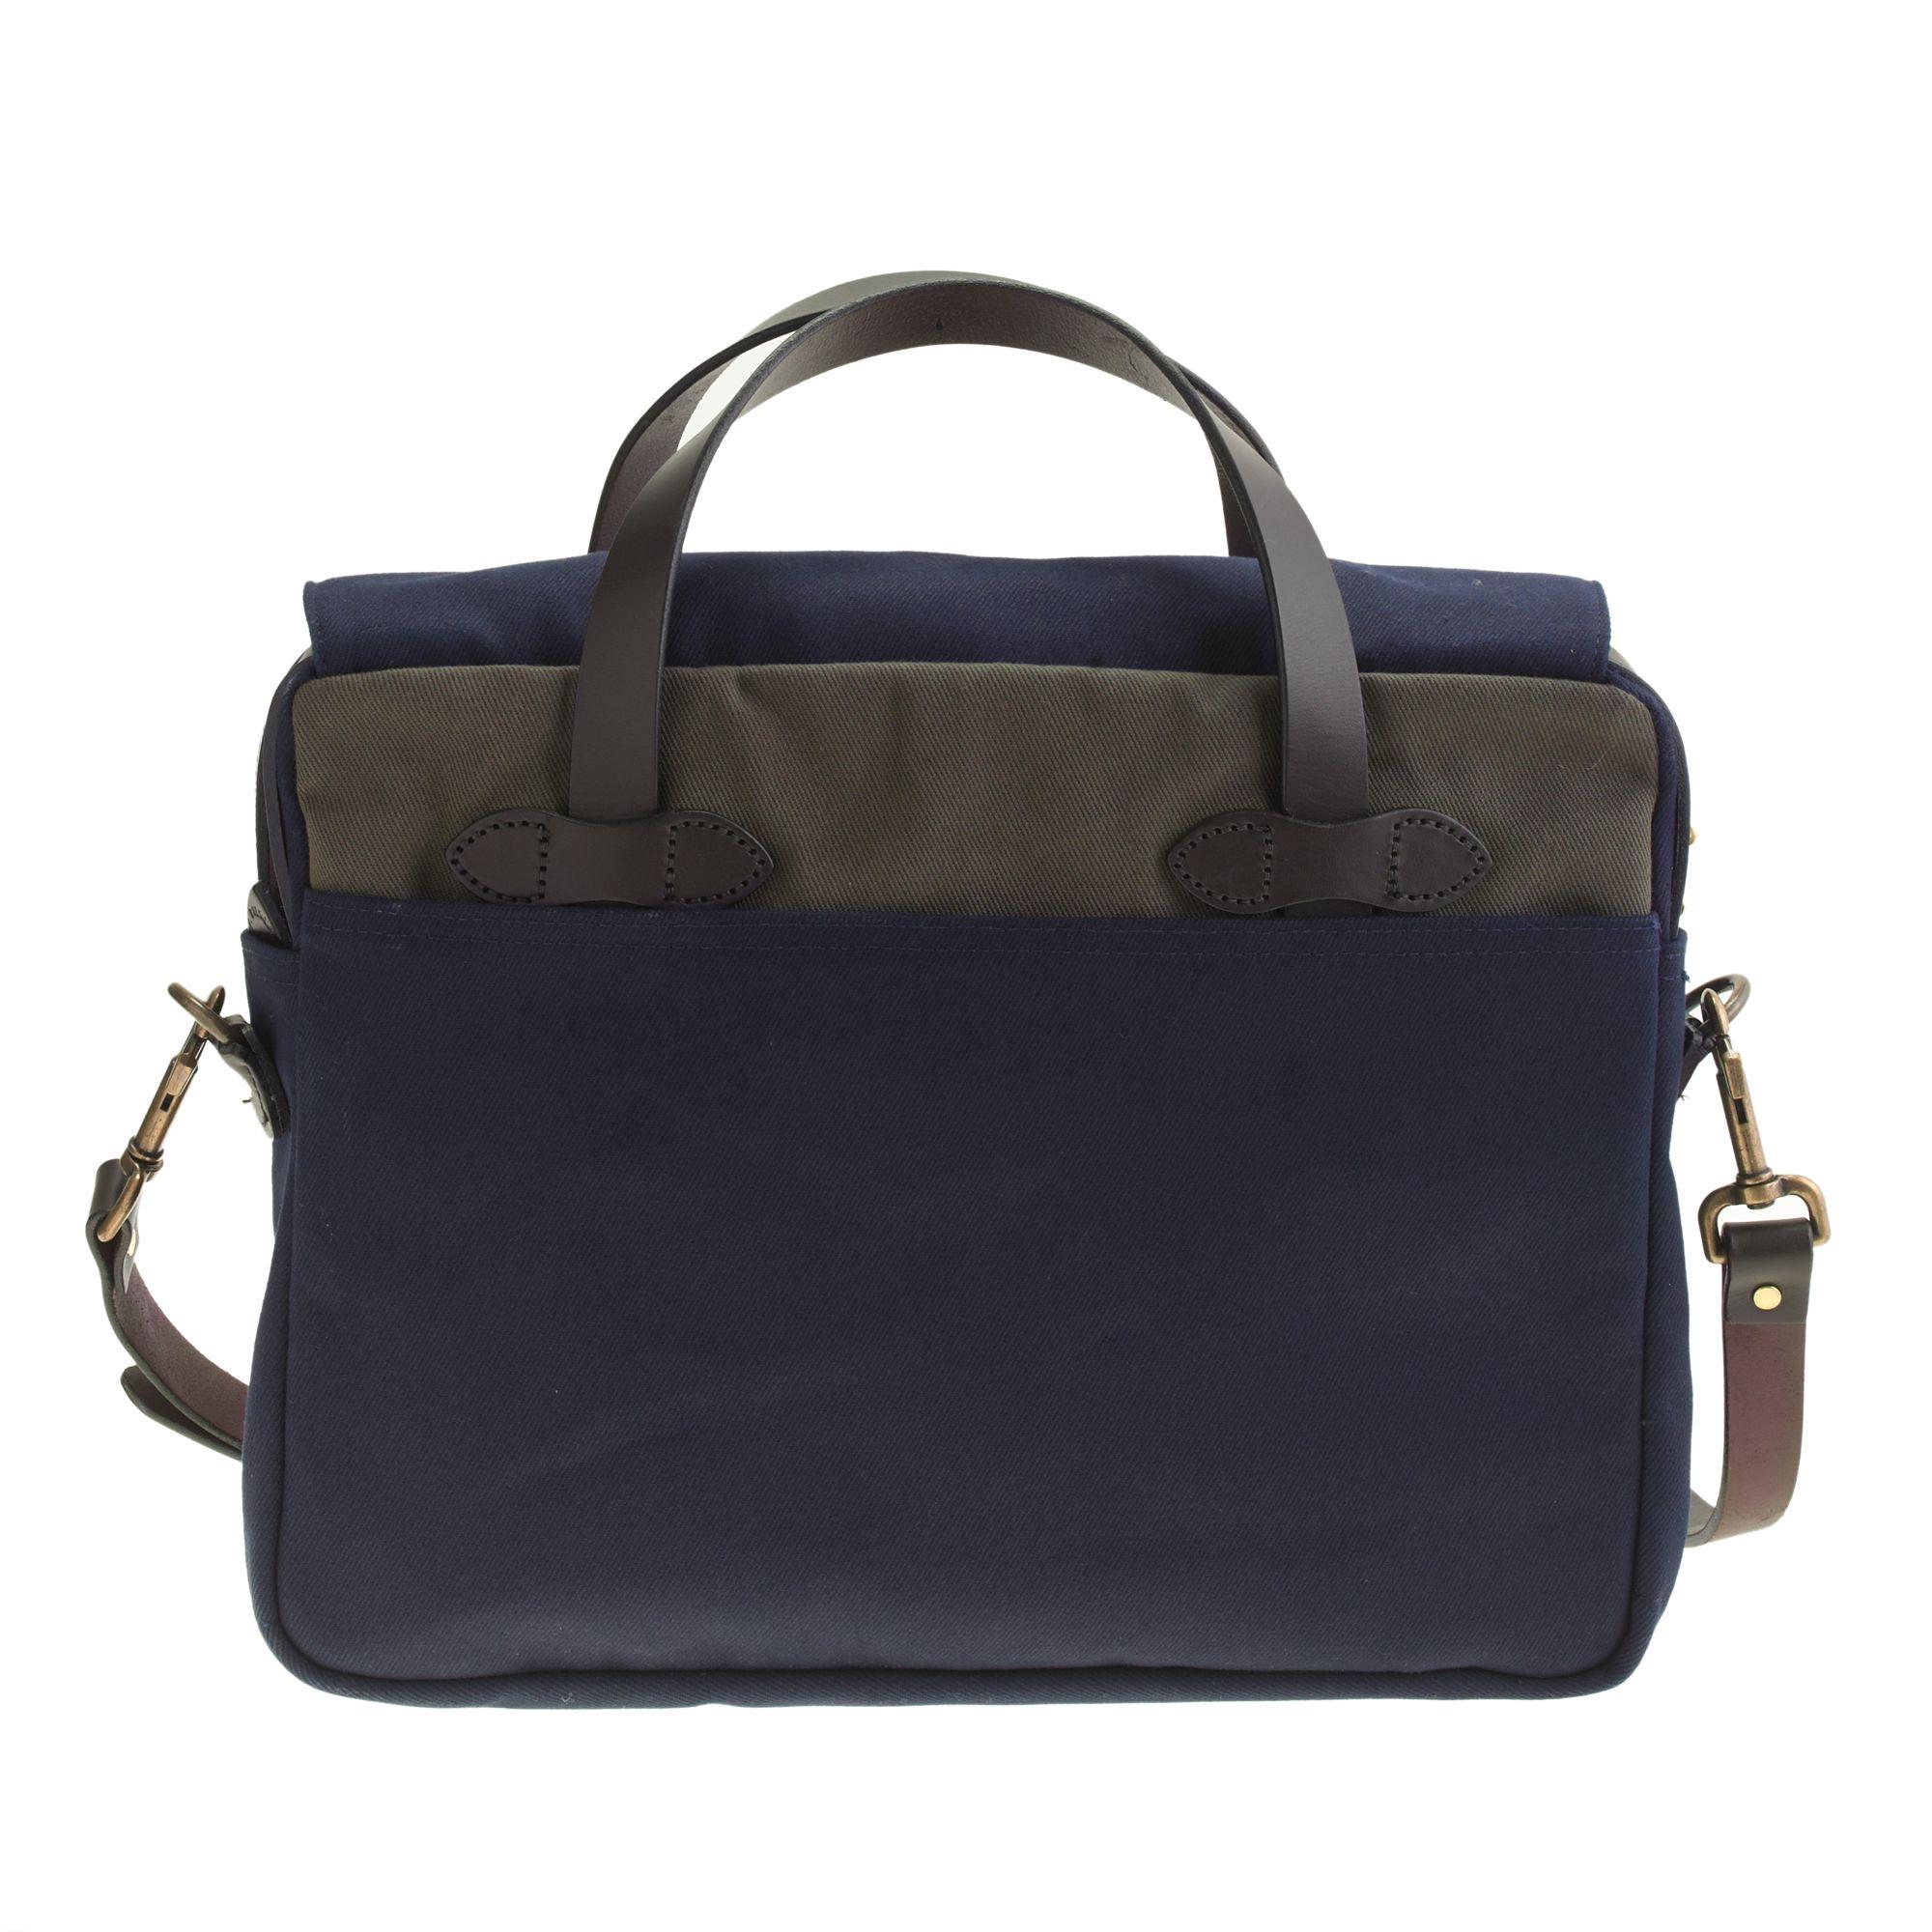 J.crew Filson Rugged Twill Briefcase In Blue For Men | Lyst